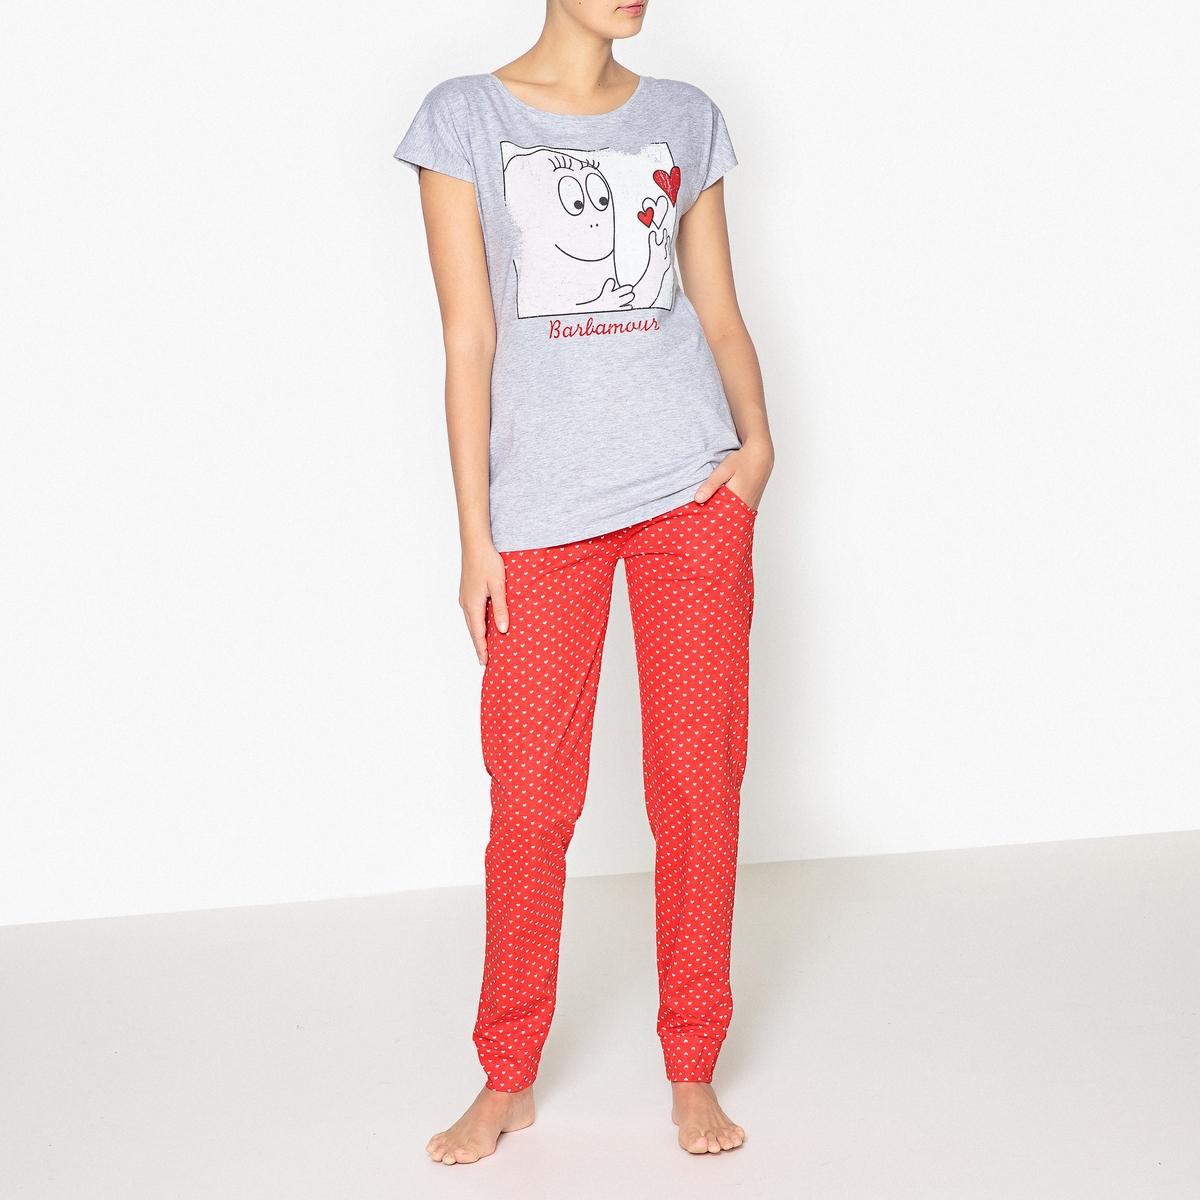 Пижама с принтом, Barbapapa